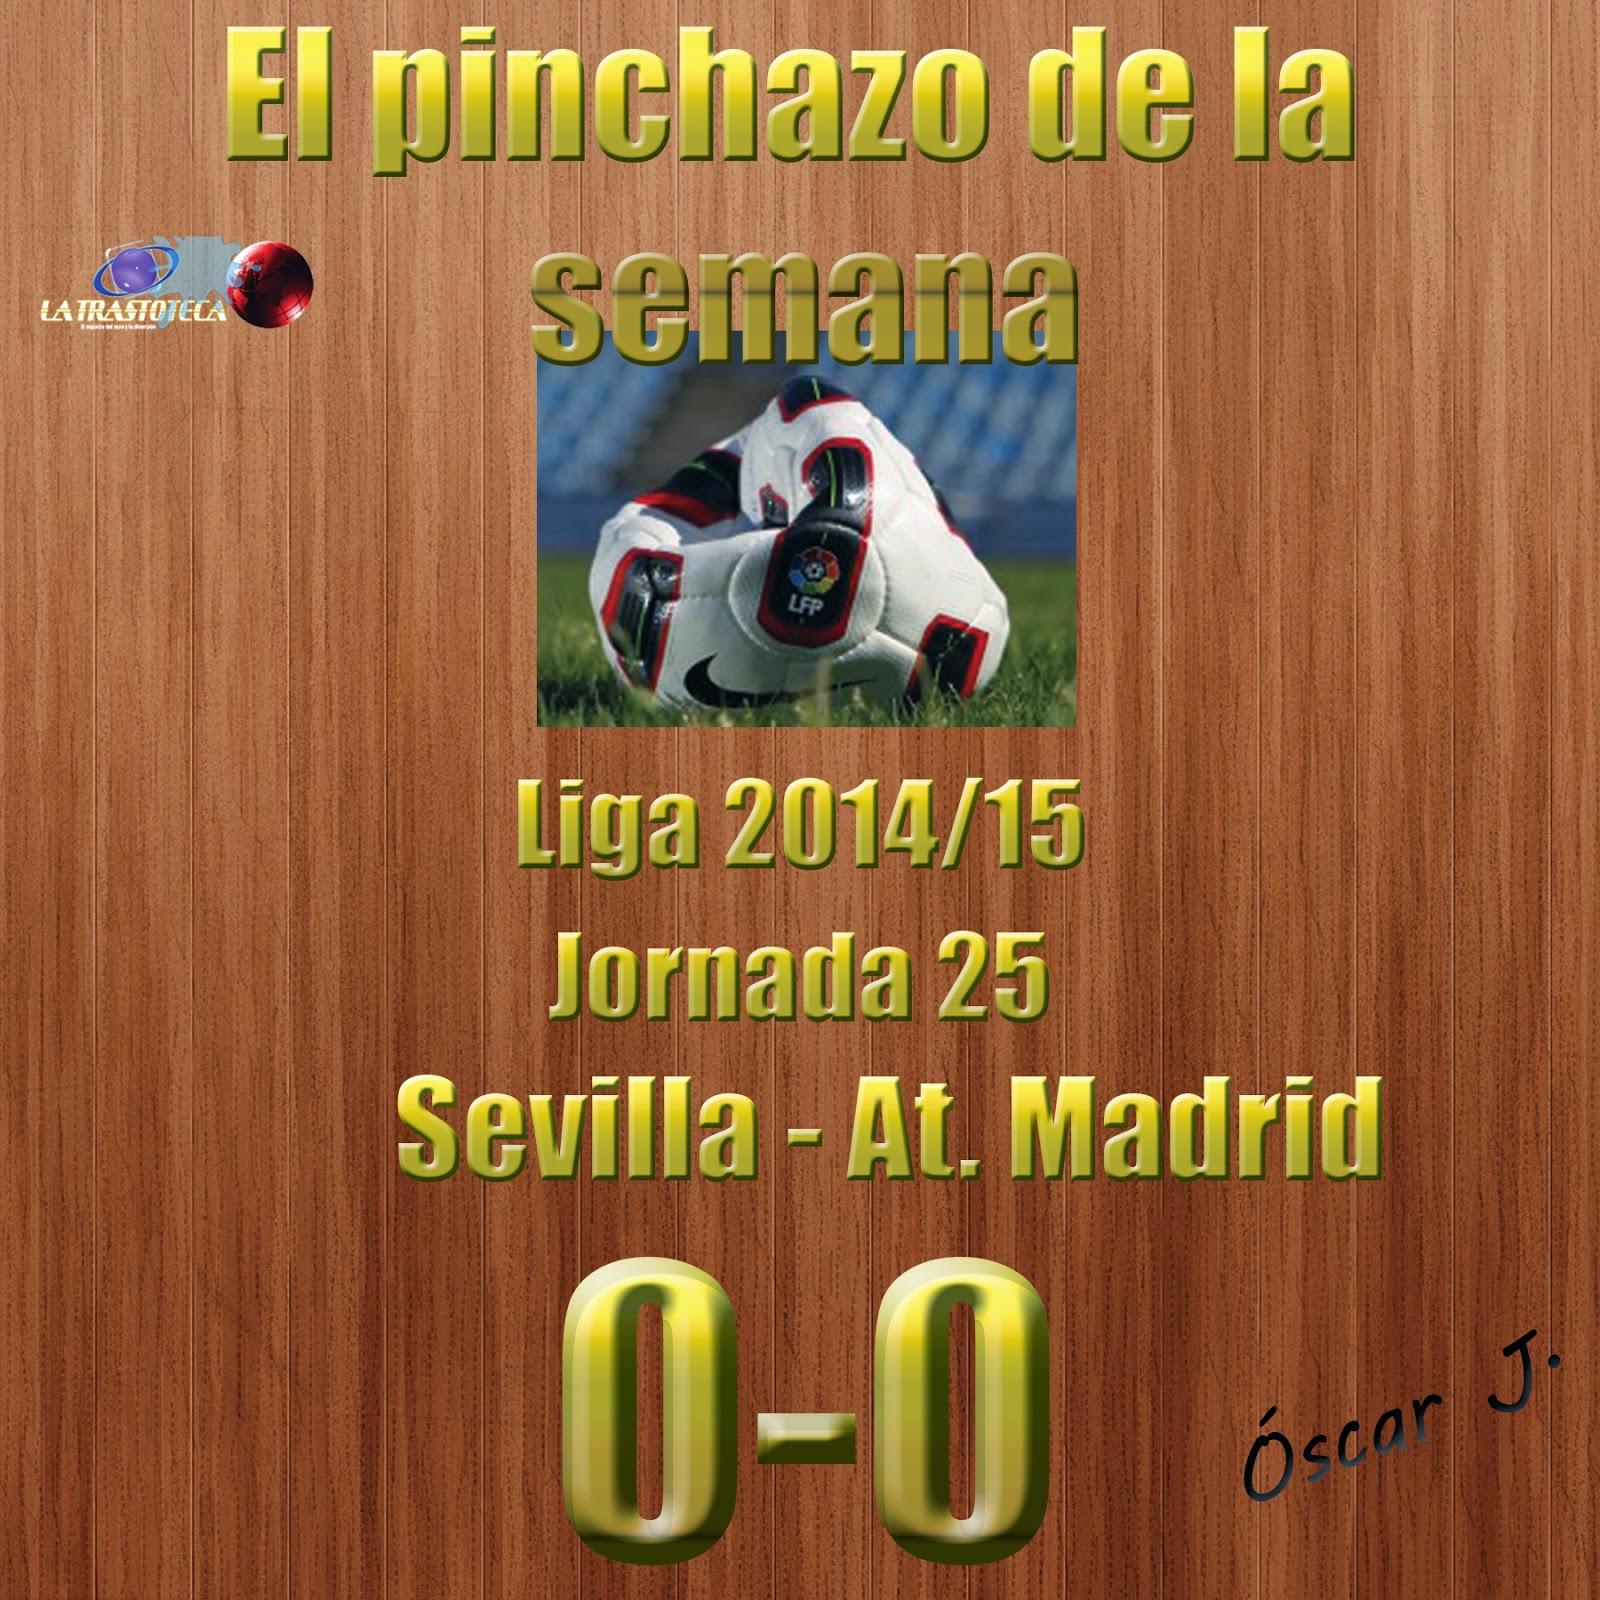 Sevilla 0-0 Atlético de Madrid. Liga 2014/15. Jornada 25. El pinchazo de la semana.